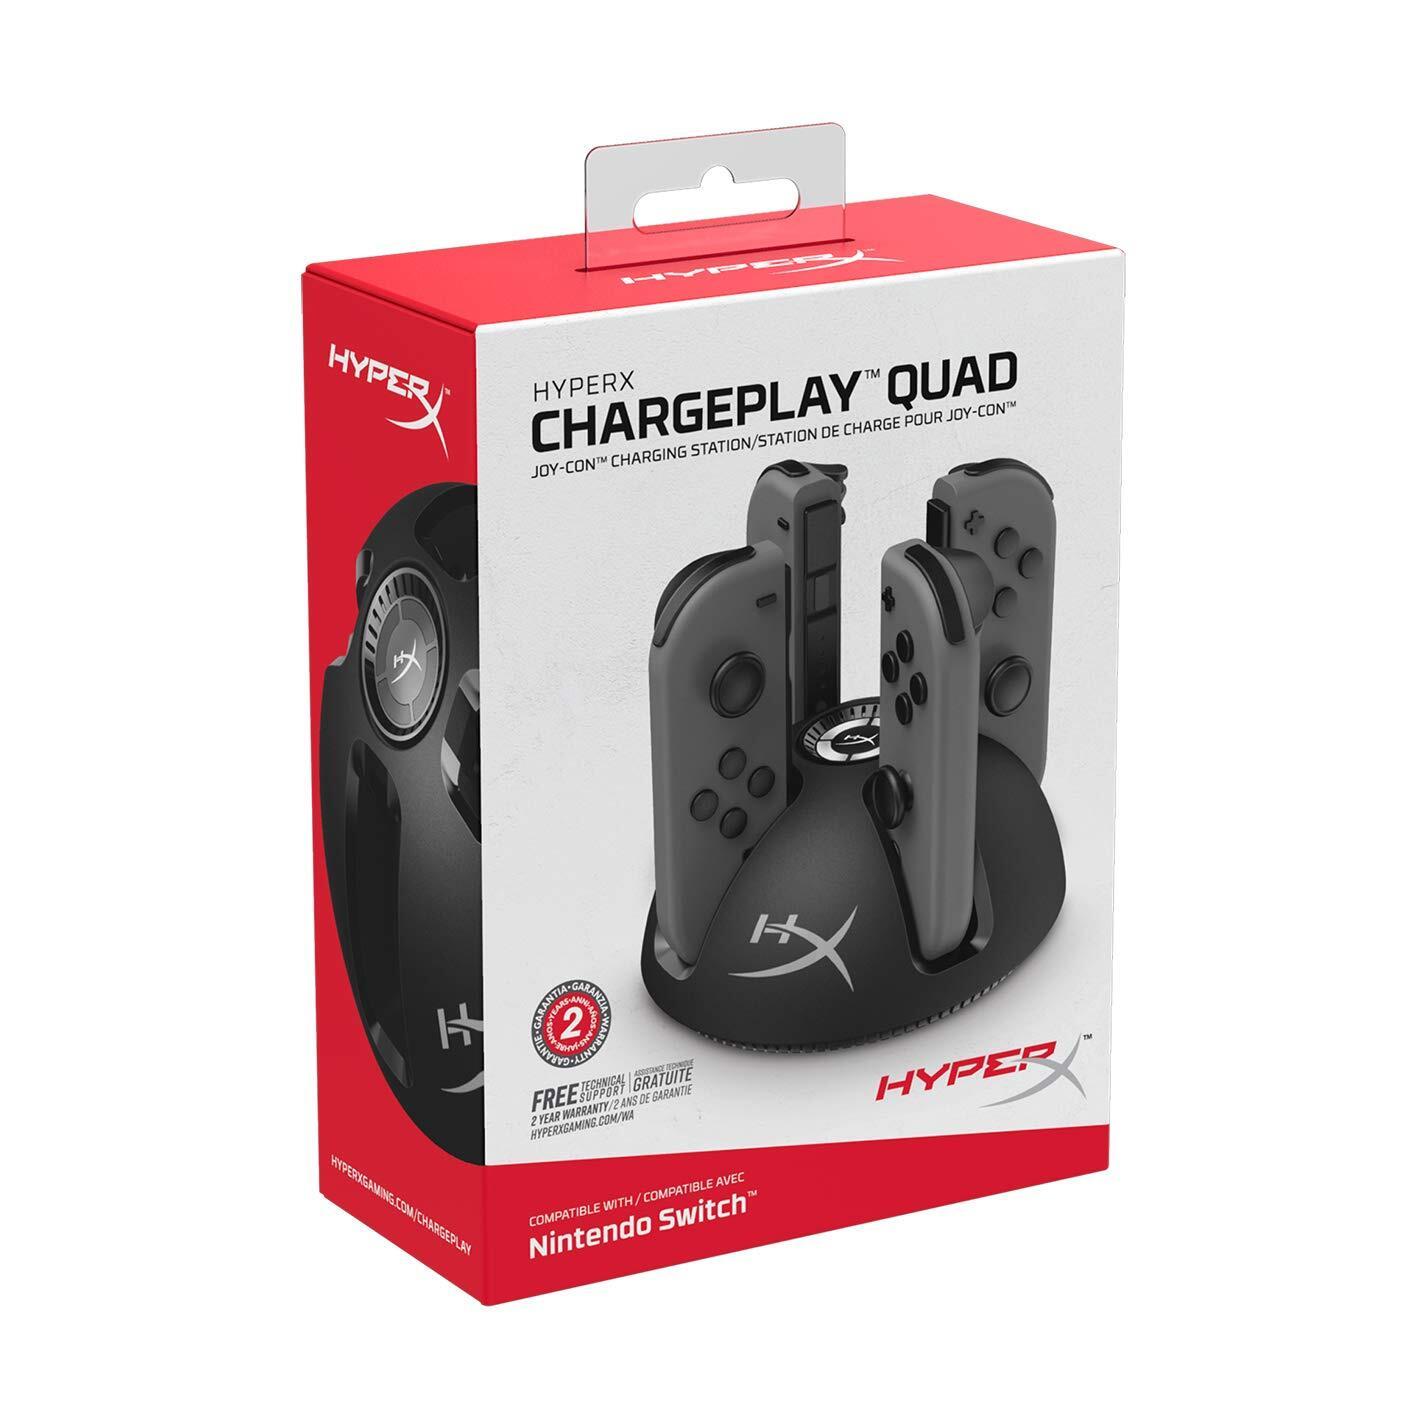 Зарядная станция HyperX ChargePlay Quad для Nintendo Switch (HX-CPQD-U) фото 4